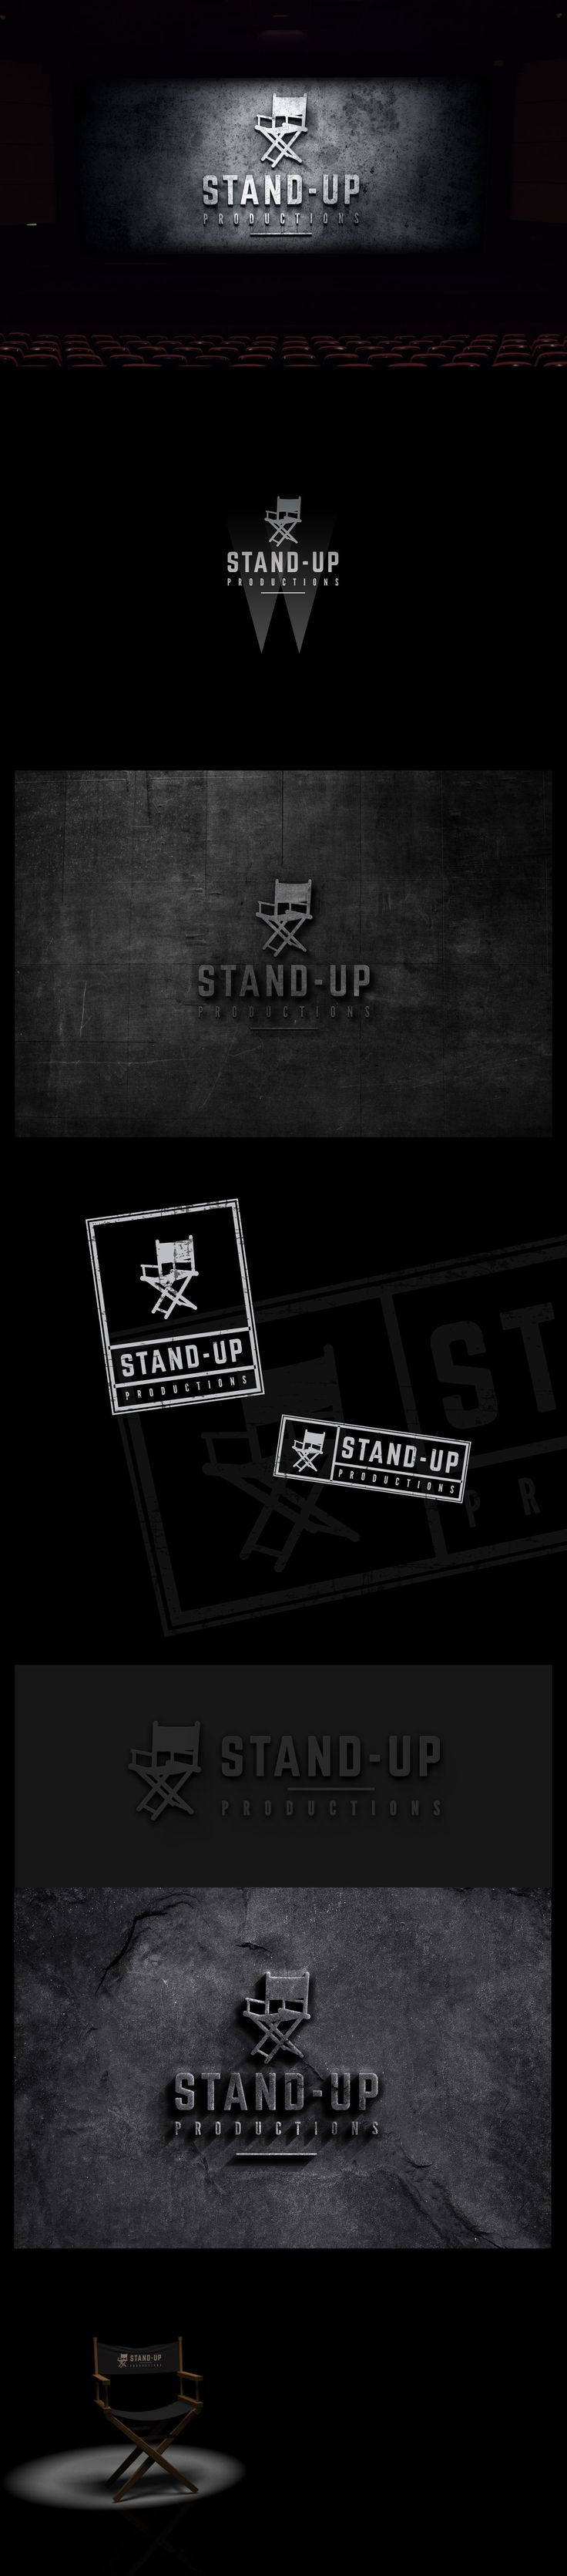 Movie, cinema, stand-up comedy logo design proposal.